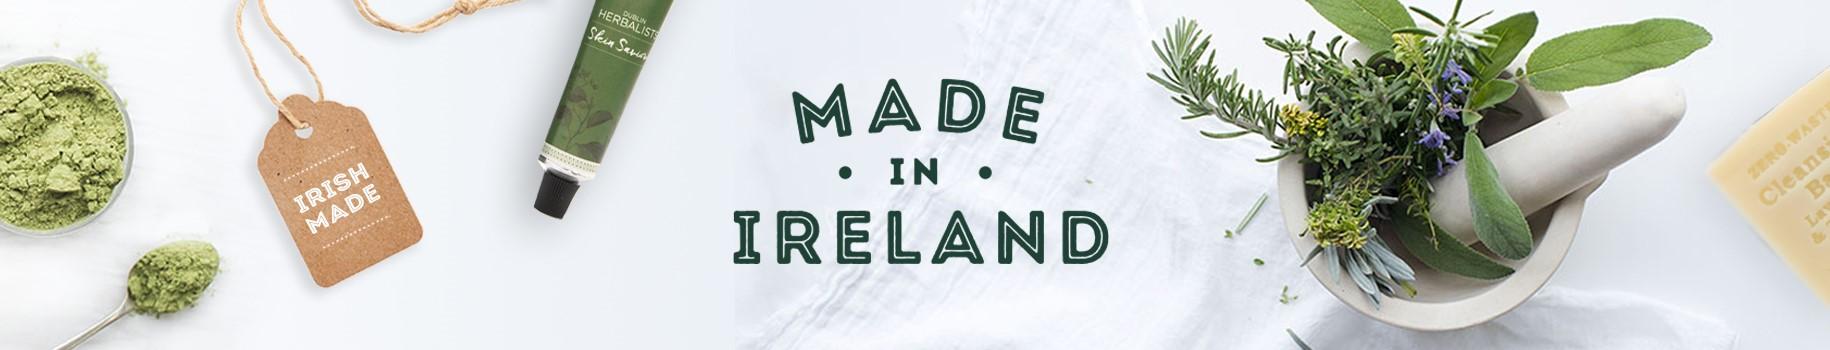 Nourish Made in Ireland - Supplements